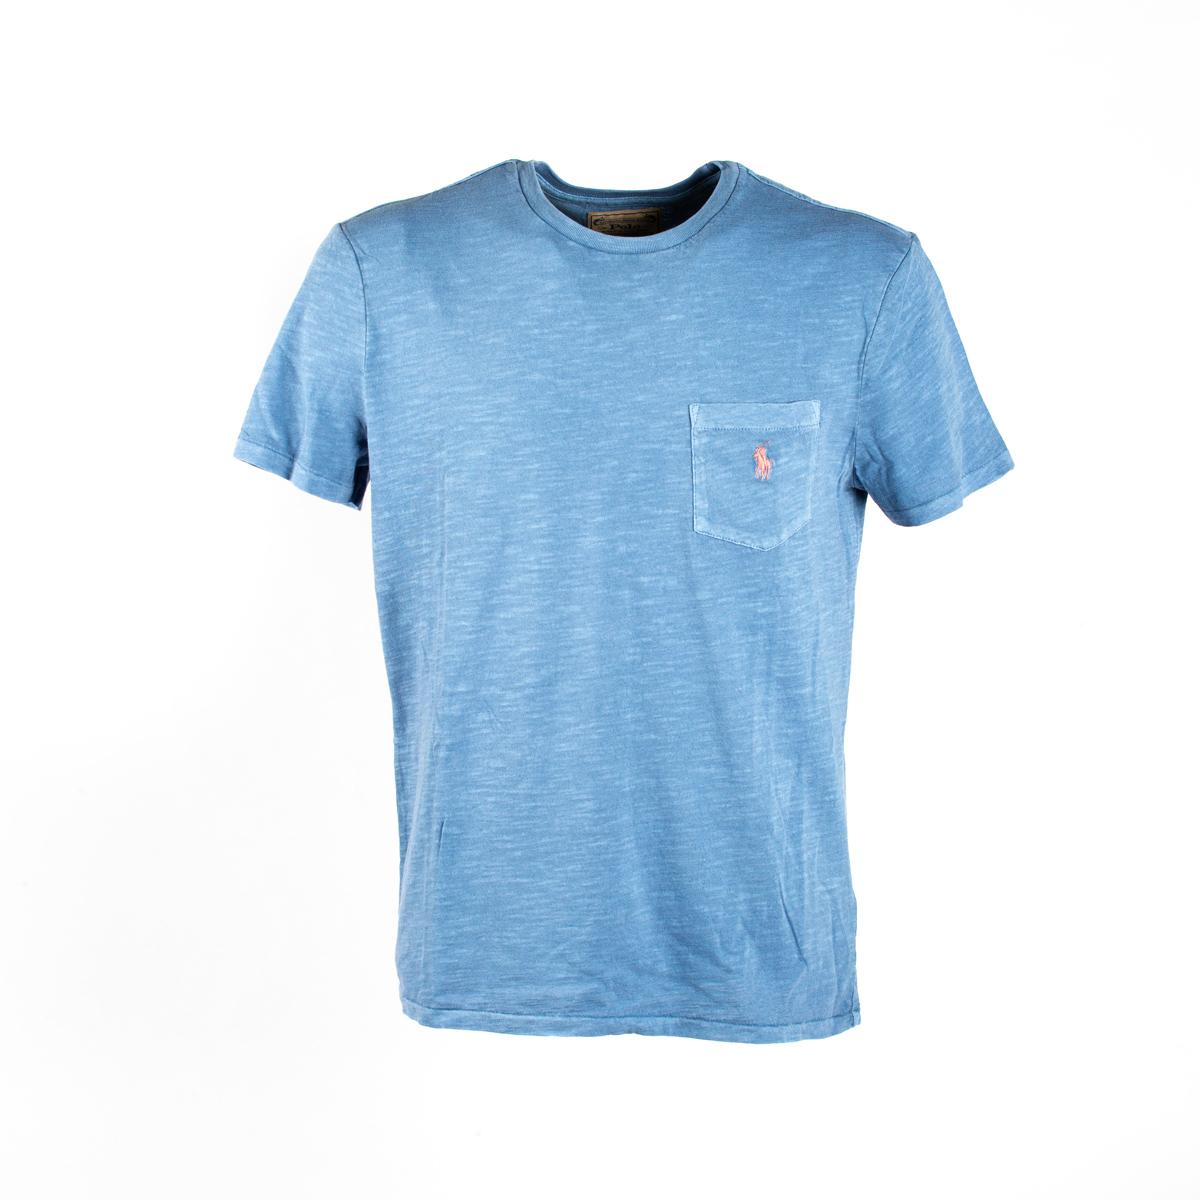 T-Shirt Polo Ralph Lauren con Taschino Azzurra